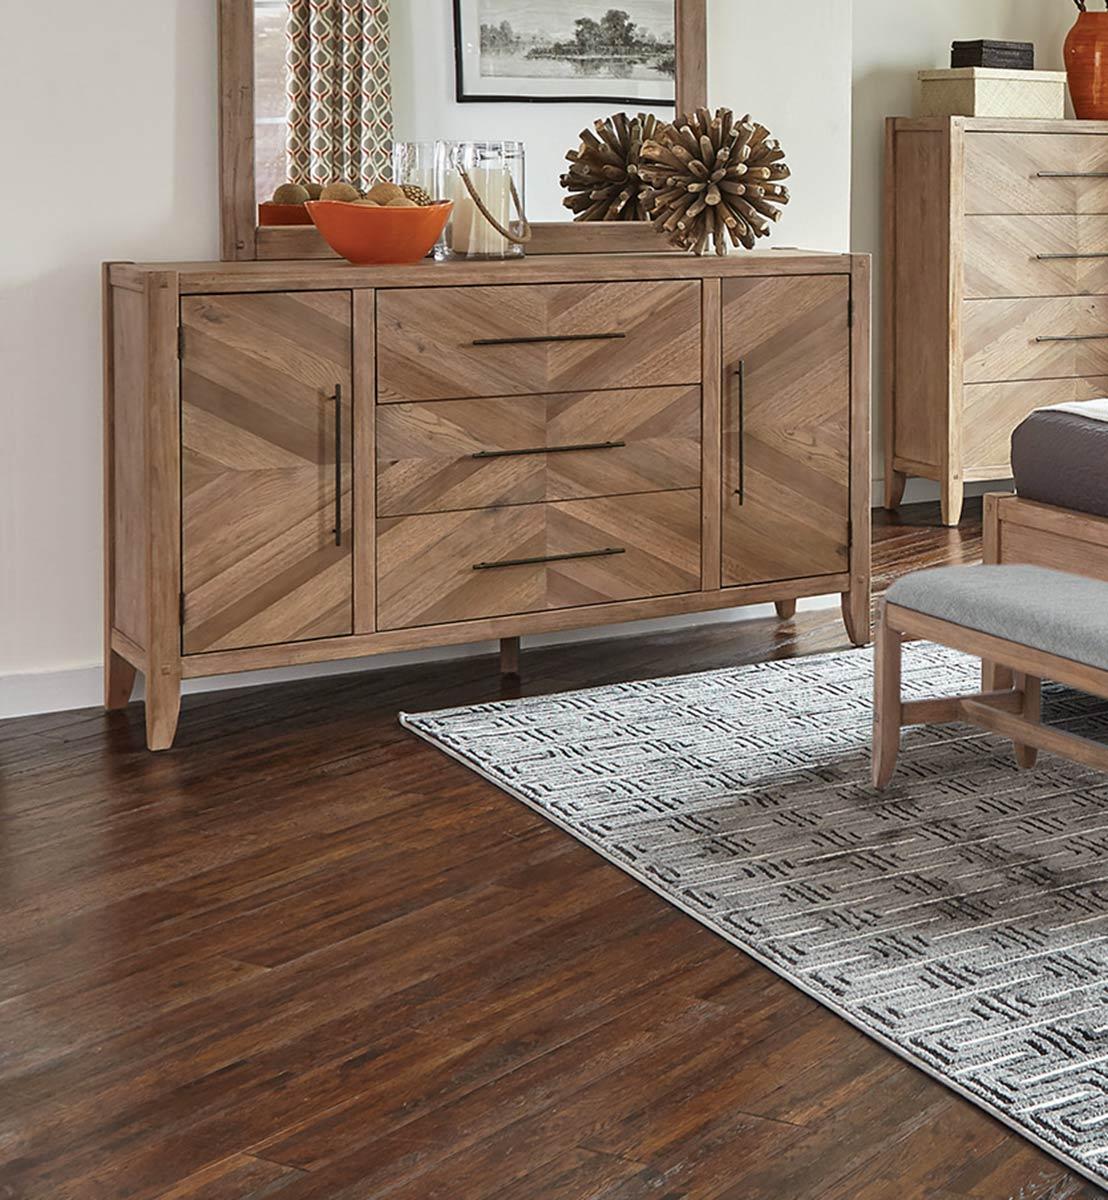 Coaster Auburn Dresser - White Washed Natural